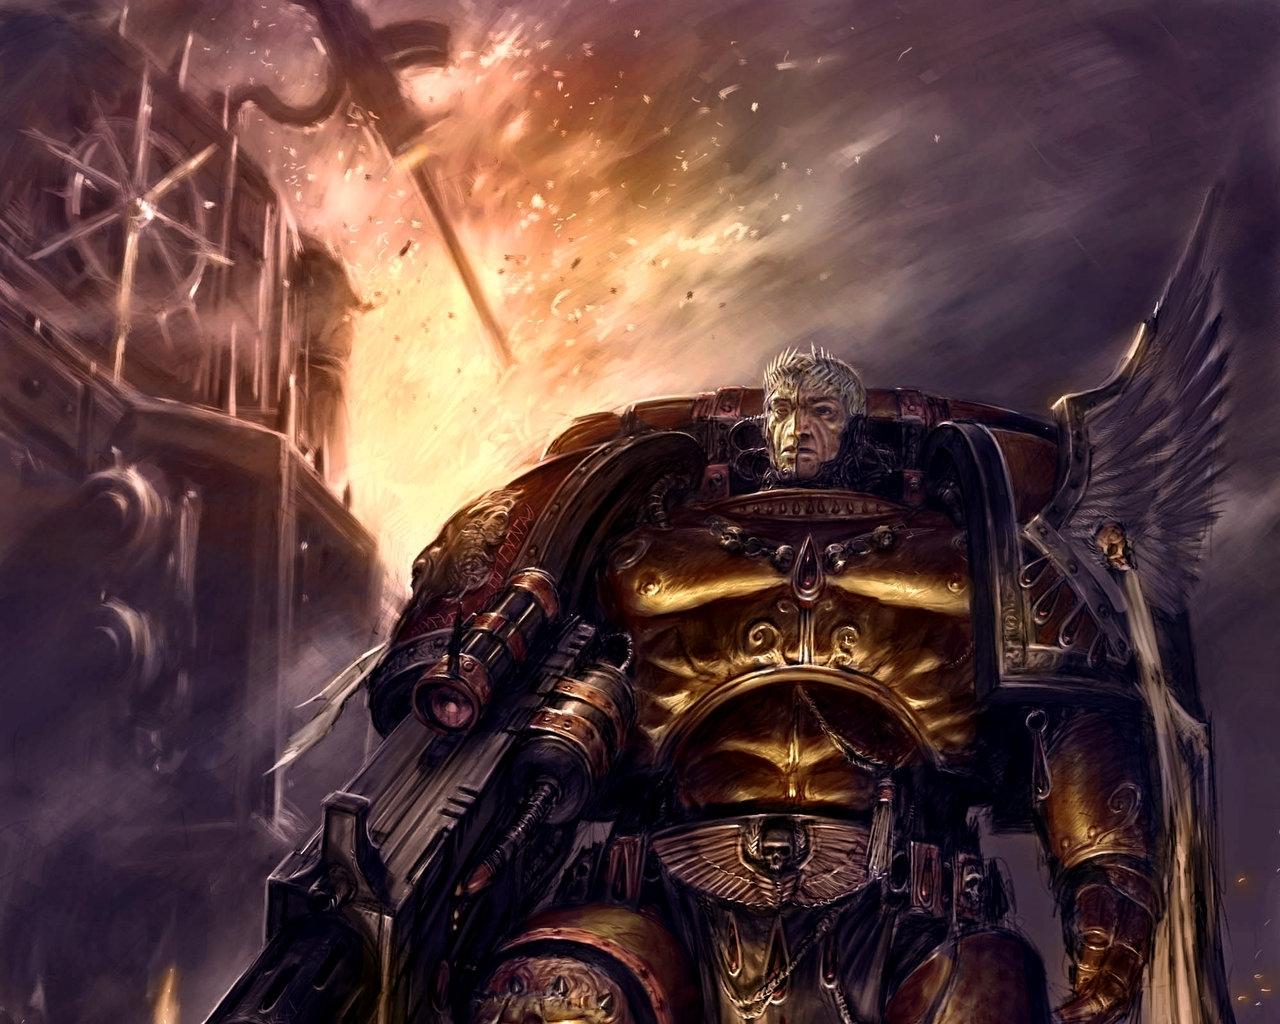 warhammer 40k space marine concept art adrian smith blood angels tycho 1280x1024